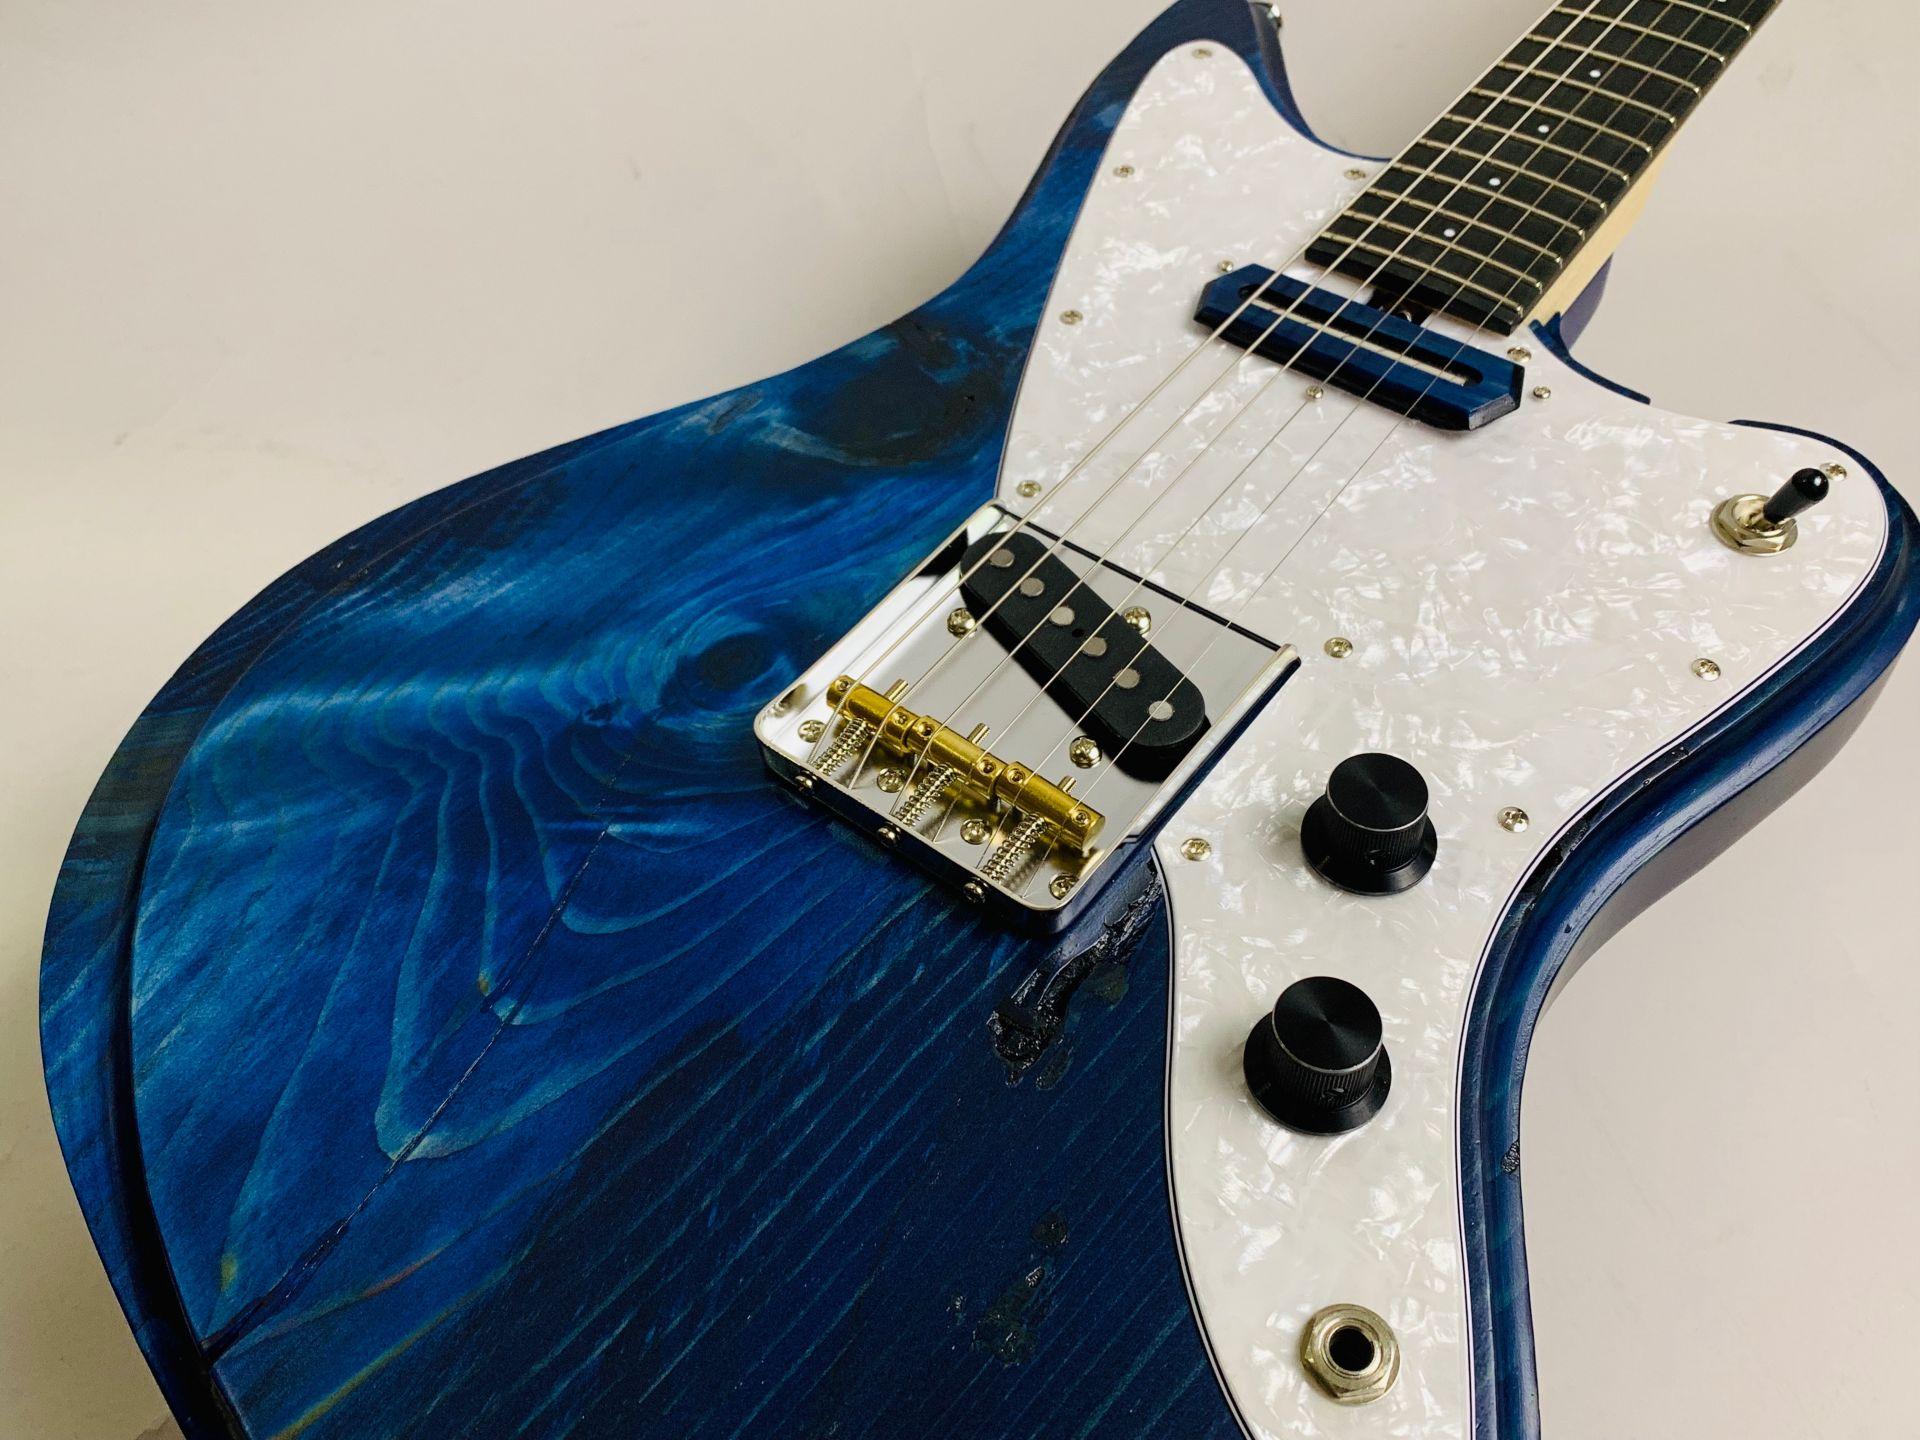 JRP/SB-I-MF'18 限定20本楽器フェアモデル 赤松ボディのボディバック-アップ画像